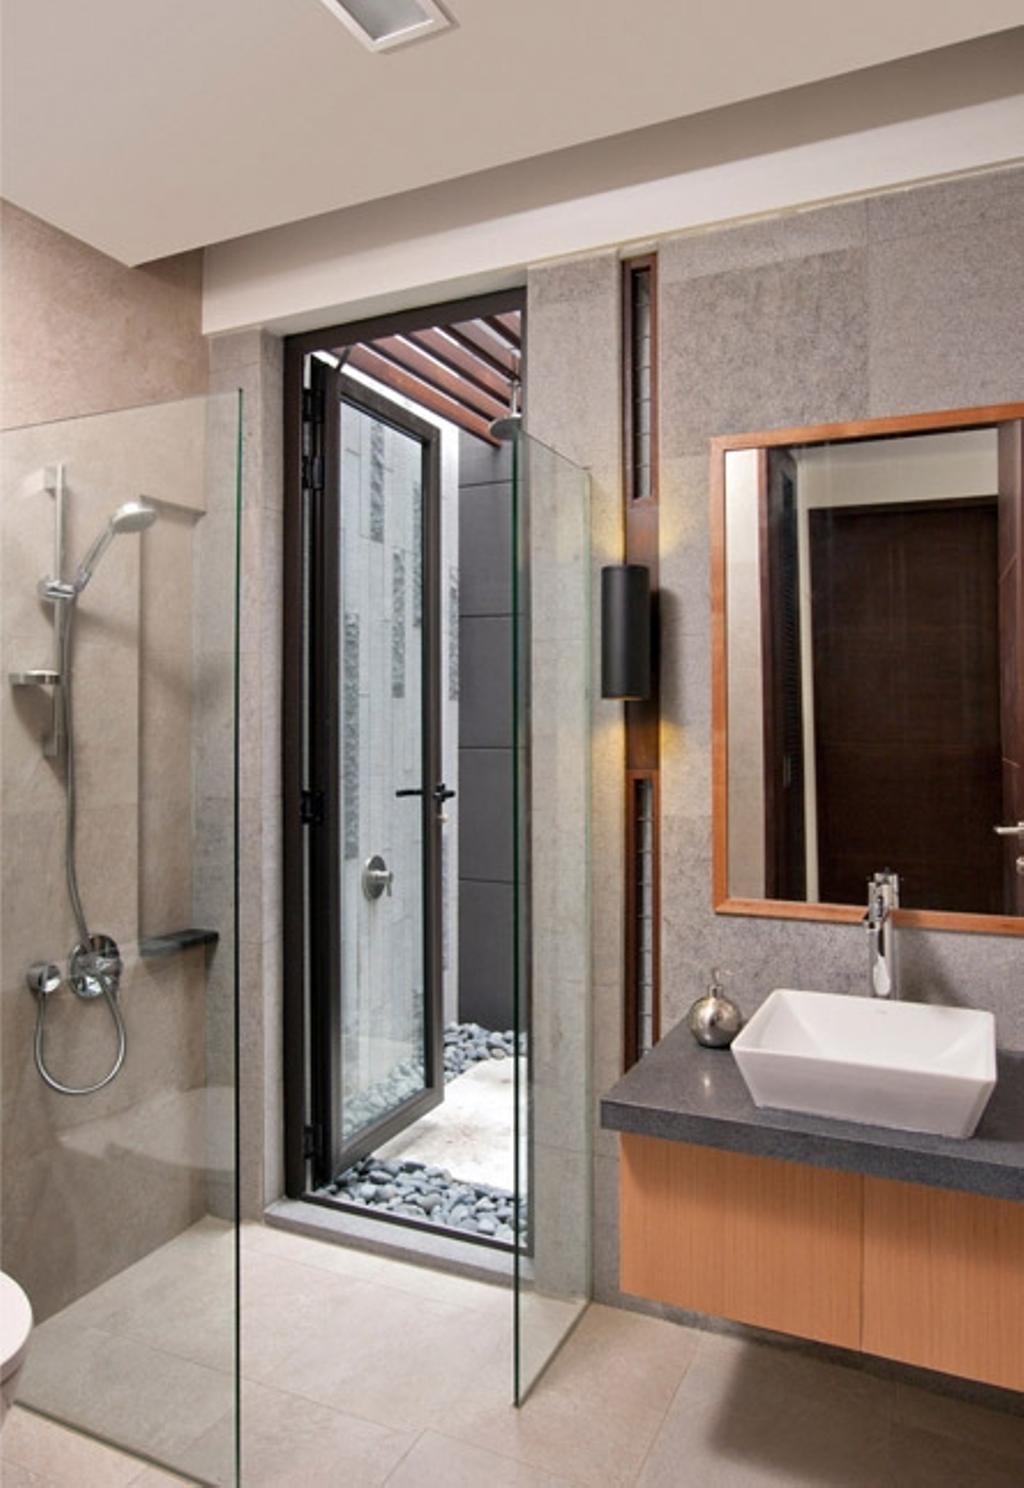 Contemporary, Condo, Bathroom, Lorong Pisang Emas, Architect, Timur Designs, Sink, Indoors, Interior Design, Room